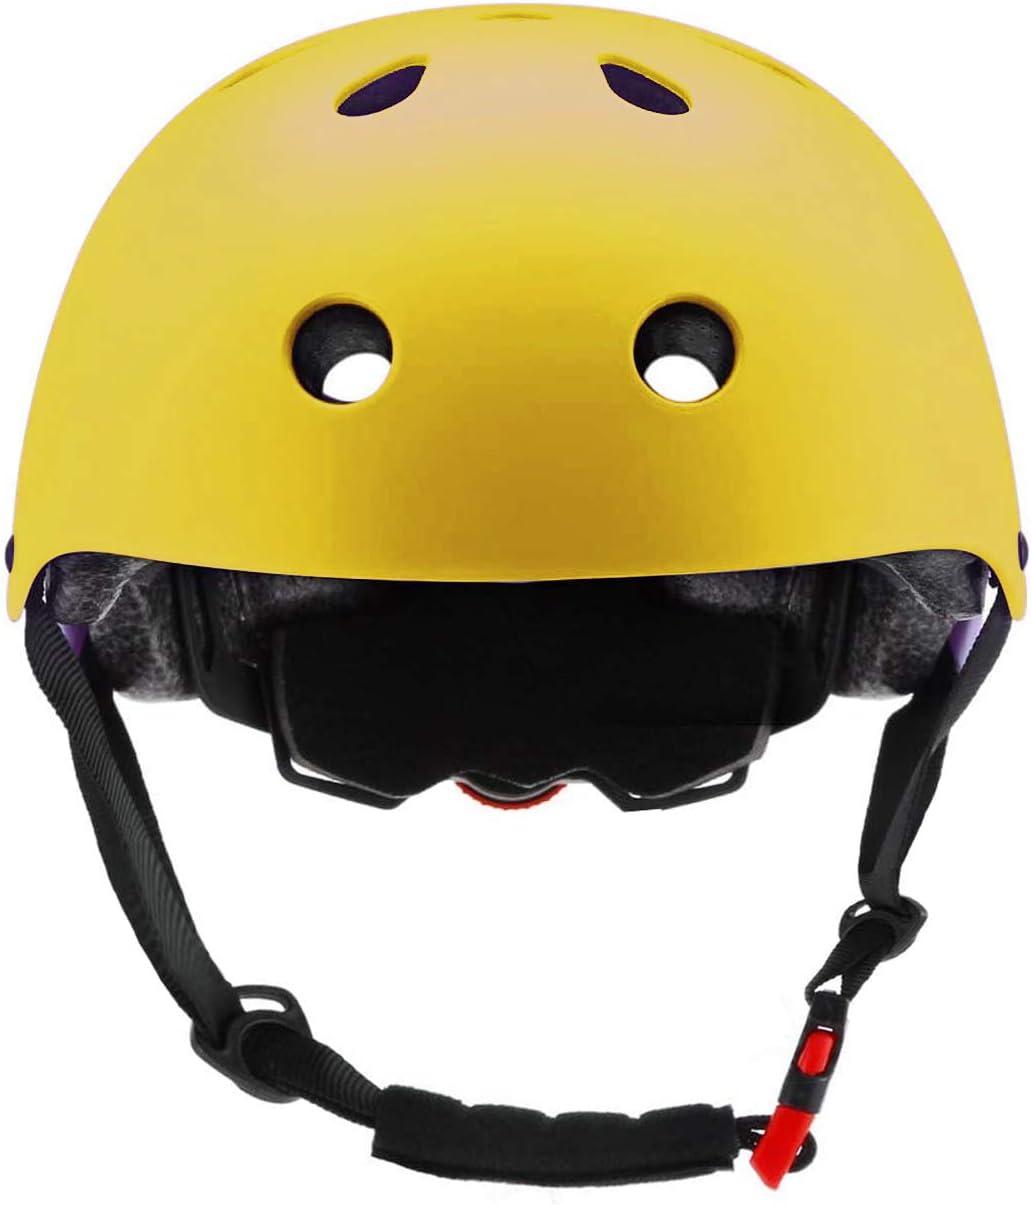 S: 48-54 cm // 18.89-21.26 ZLEIOUY Kids Bike Helmet Toddler Helmet Children Multi-Sport Helmet CPSC Certified Impact Resistance Ventilation Adjustable Helmet Youth Kids Skateboard Cycling Helmet